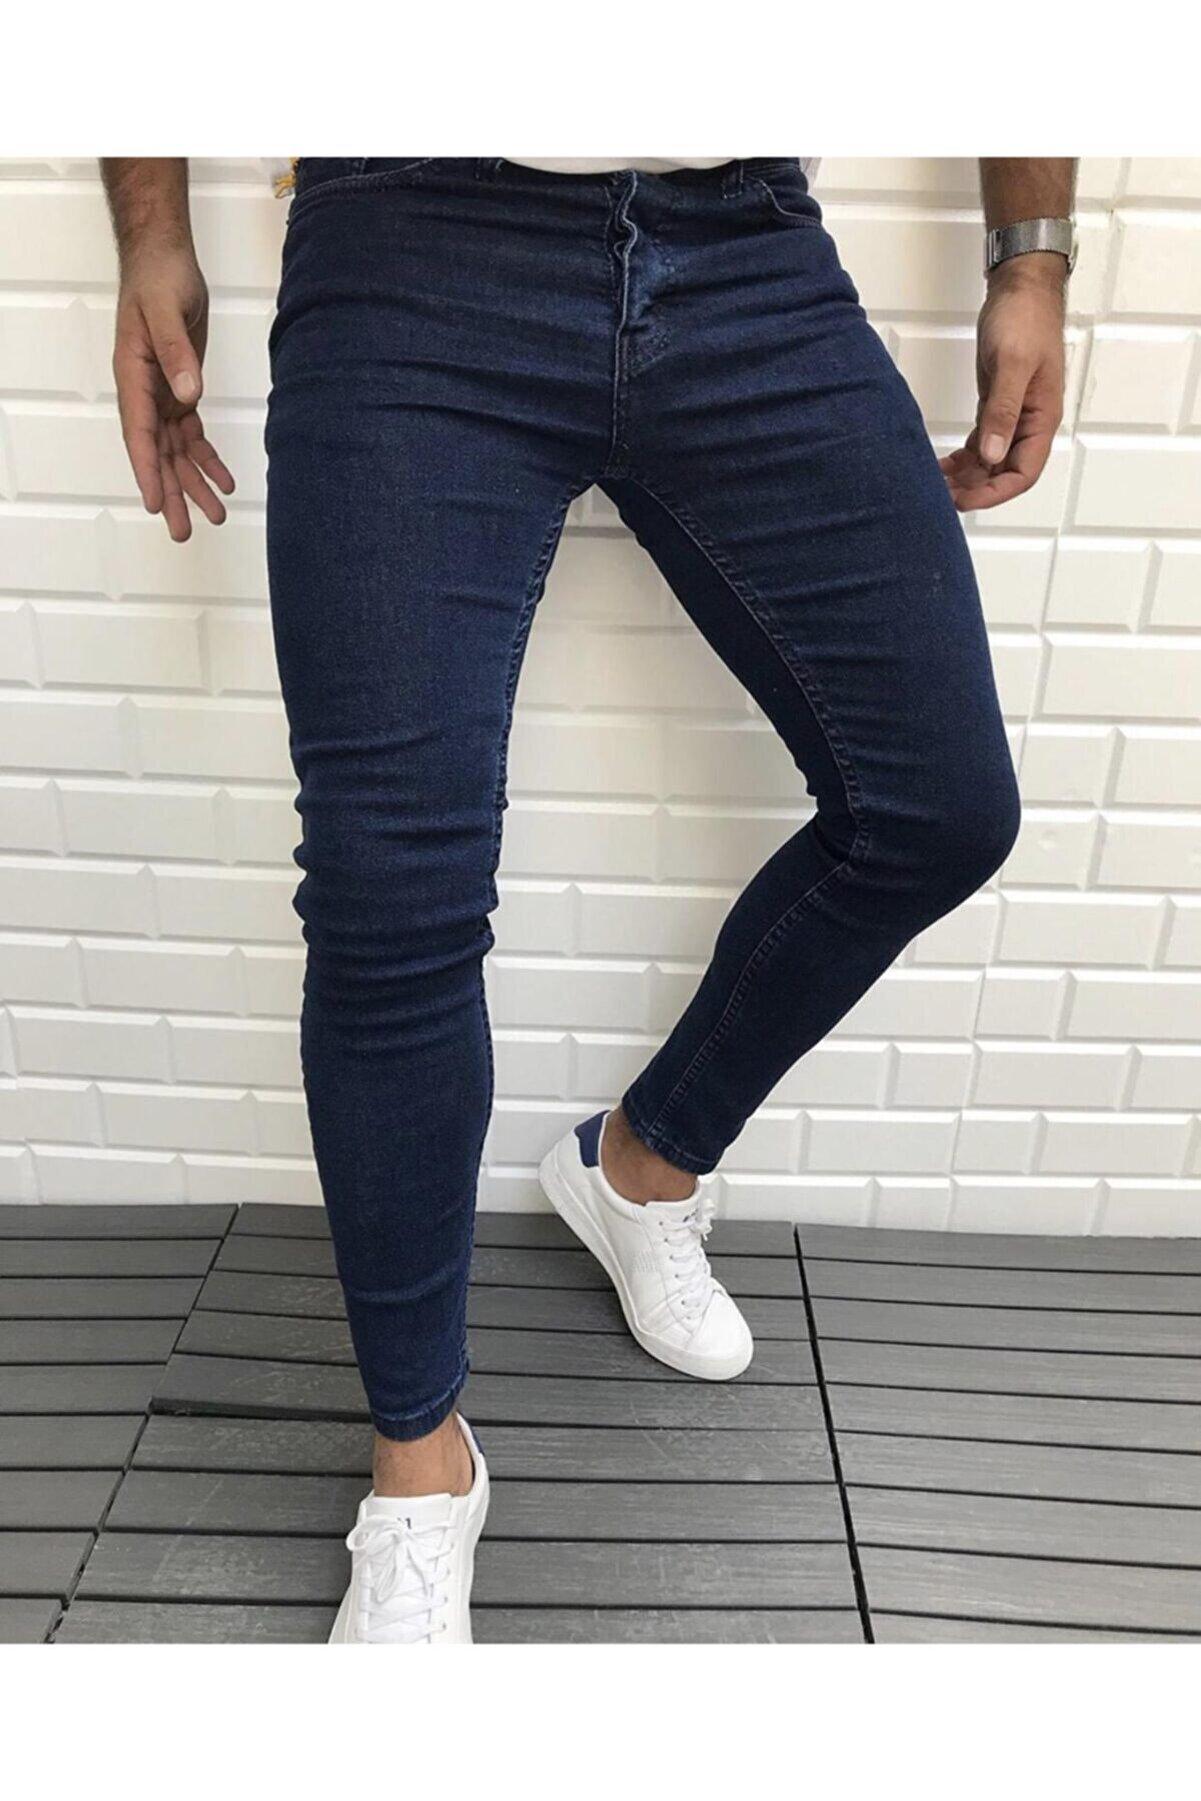 ukdwear Erkek Lacivert Slim Fit Kot Pantolon